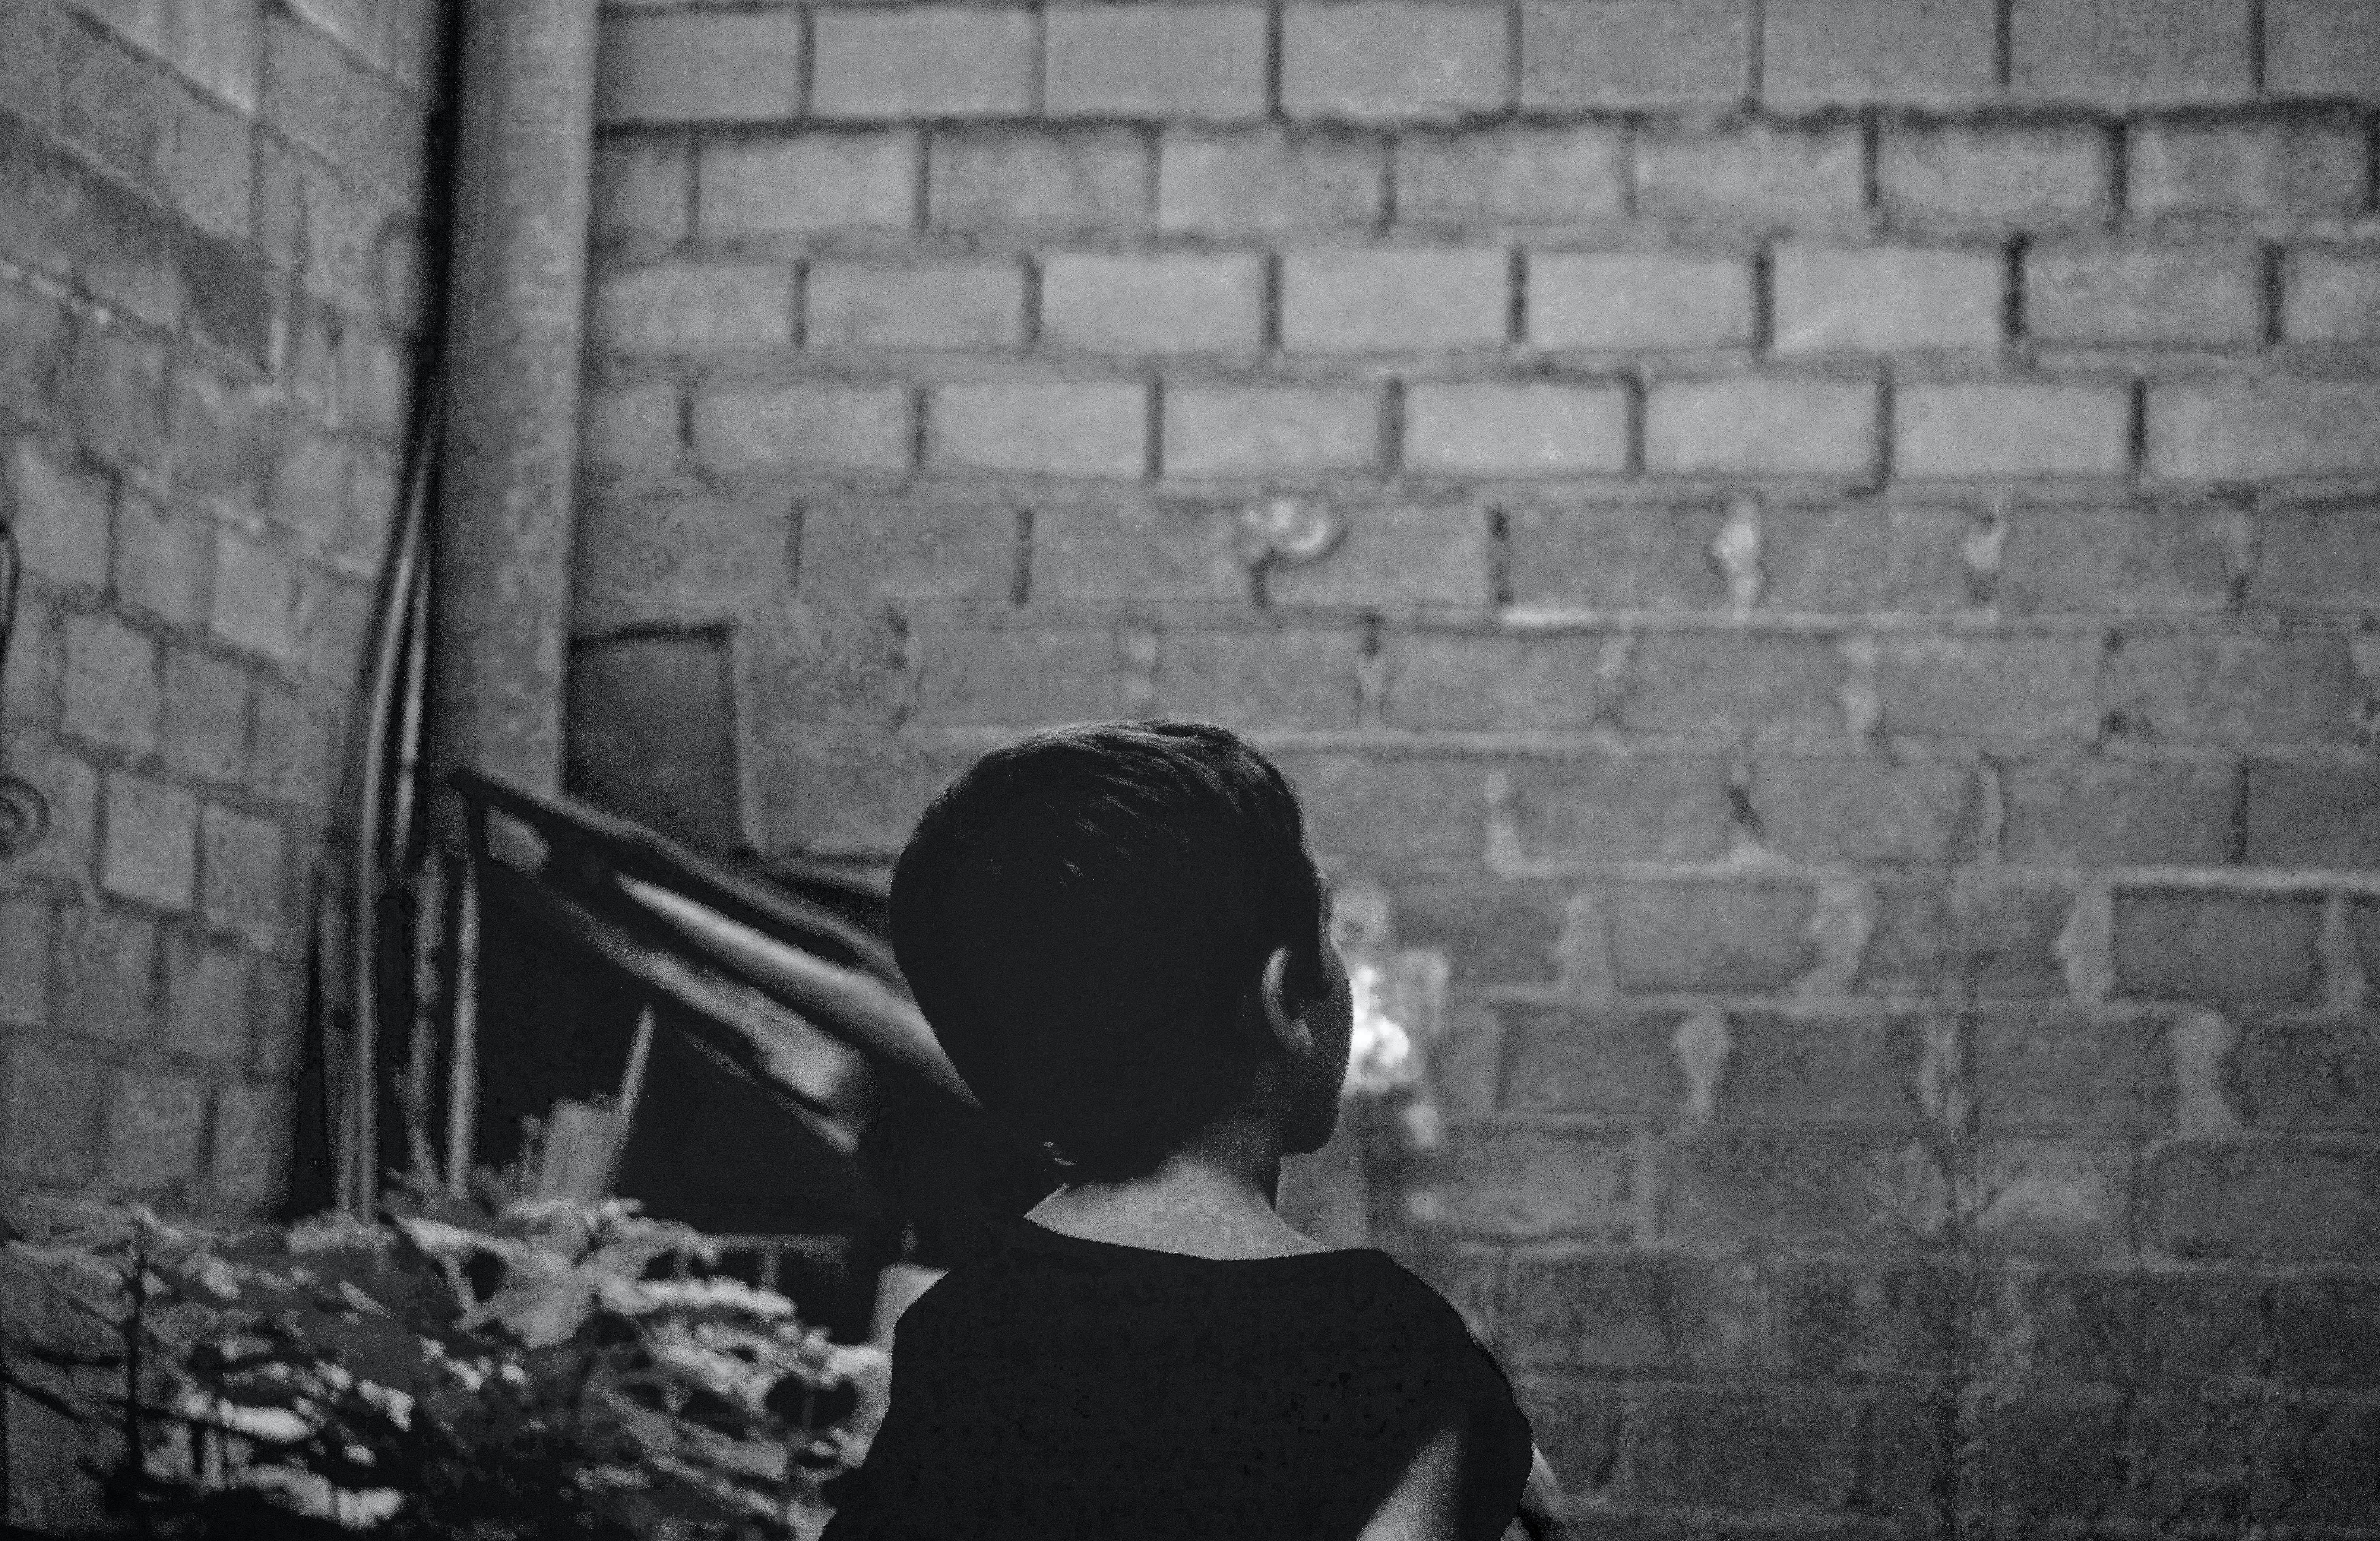 grayscale photo of boy standing near wall